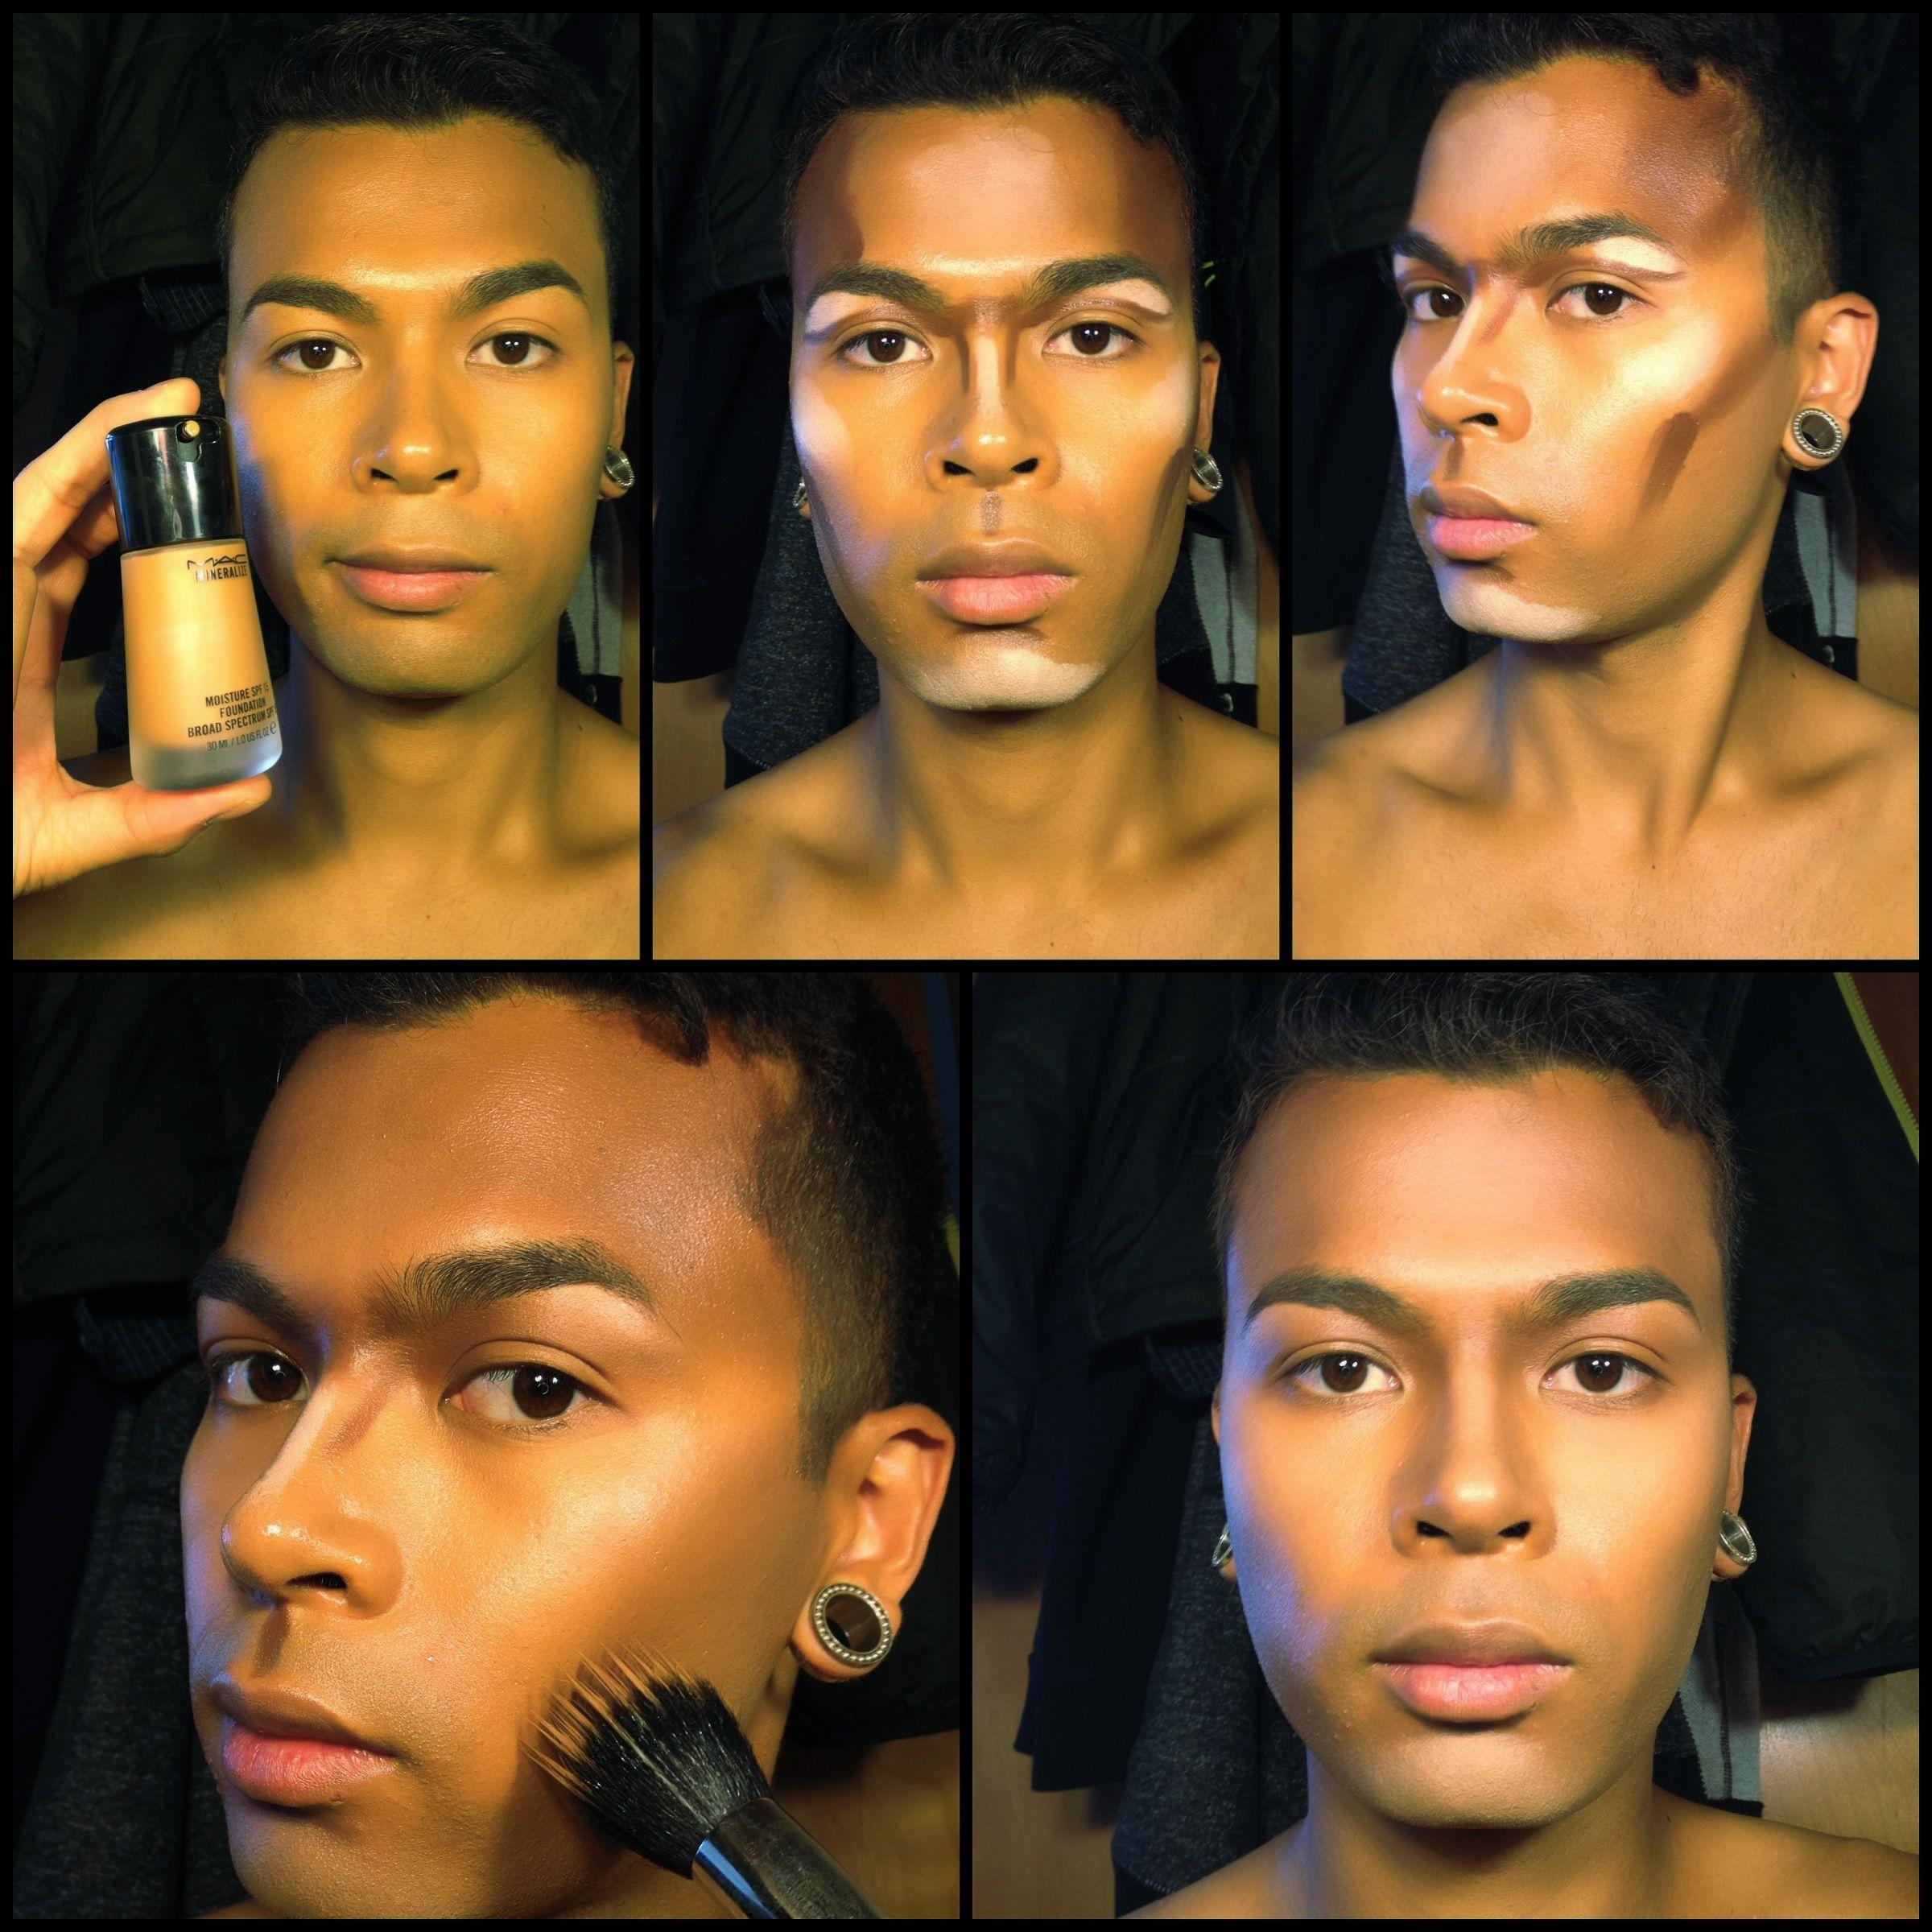 Male contour tutorial instagram davidyubeauty portland or male contour tutorial instagram davidyubeauty portland or baditri Image collections